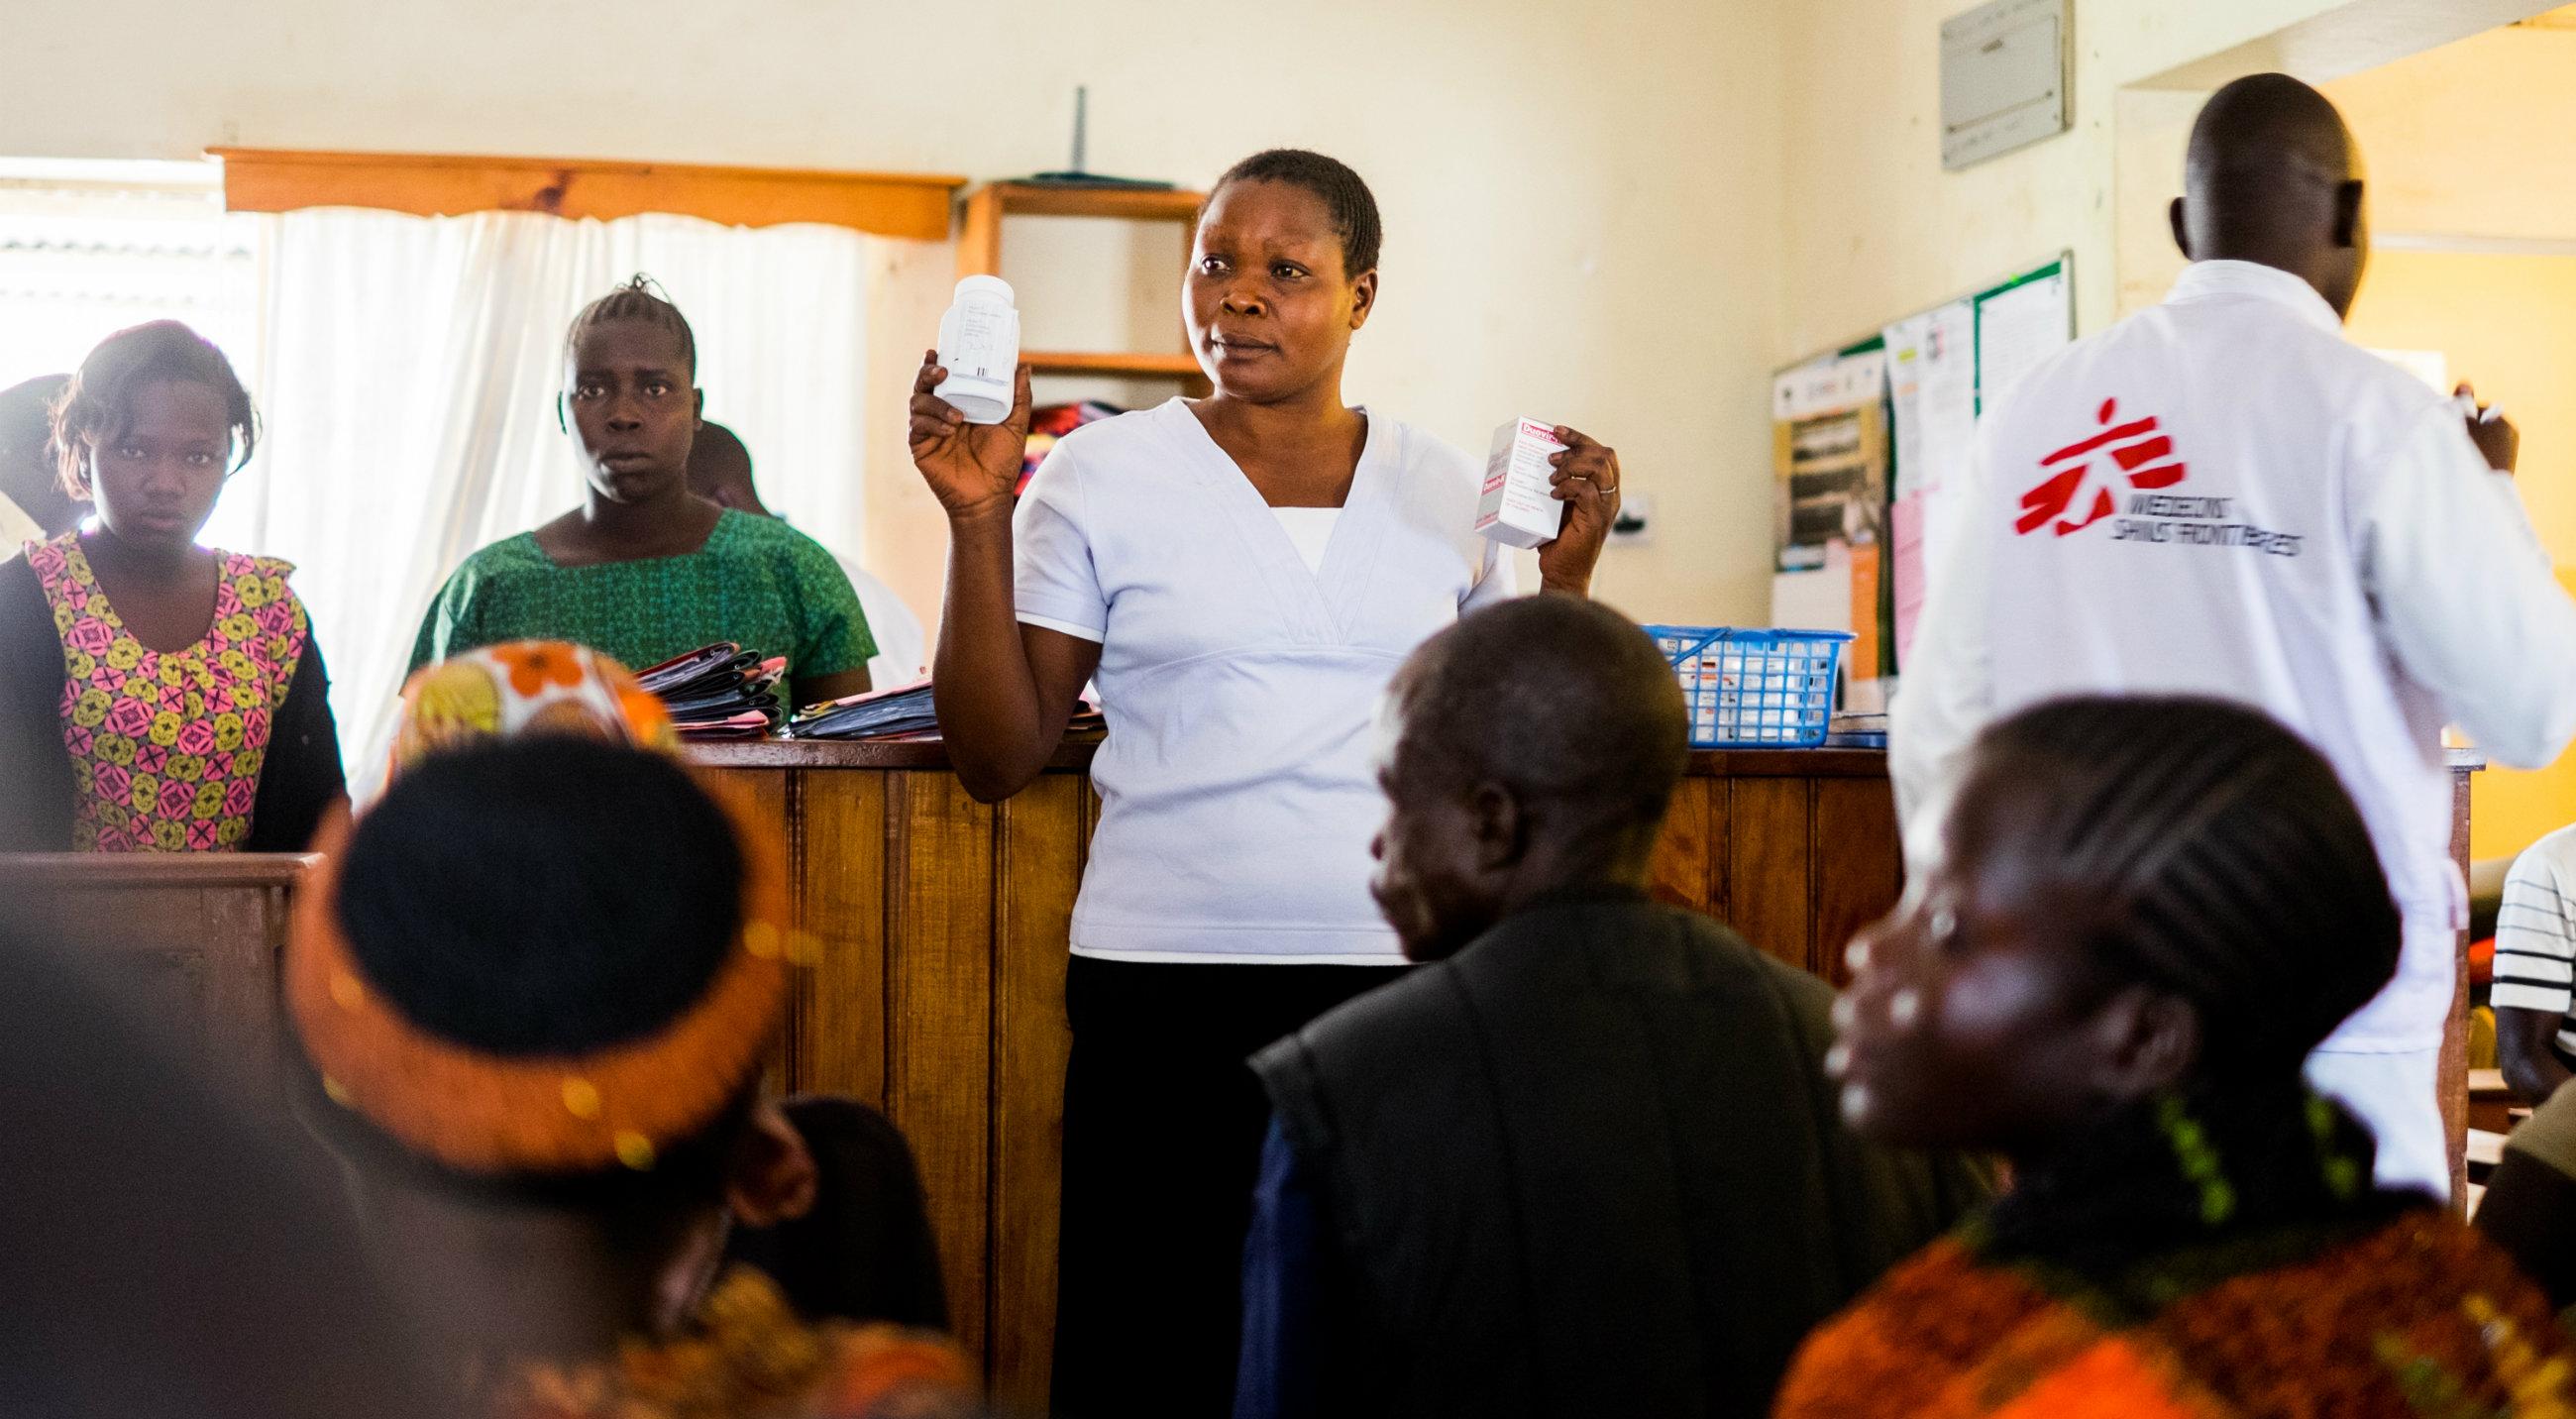 25 miljoner har hiv aids i afrika 2